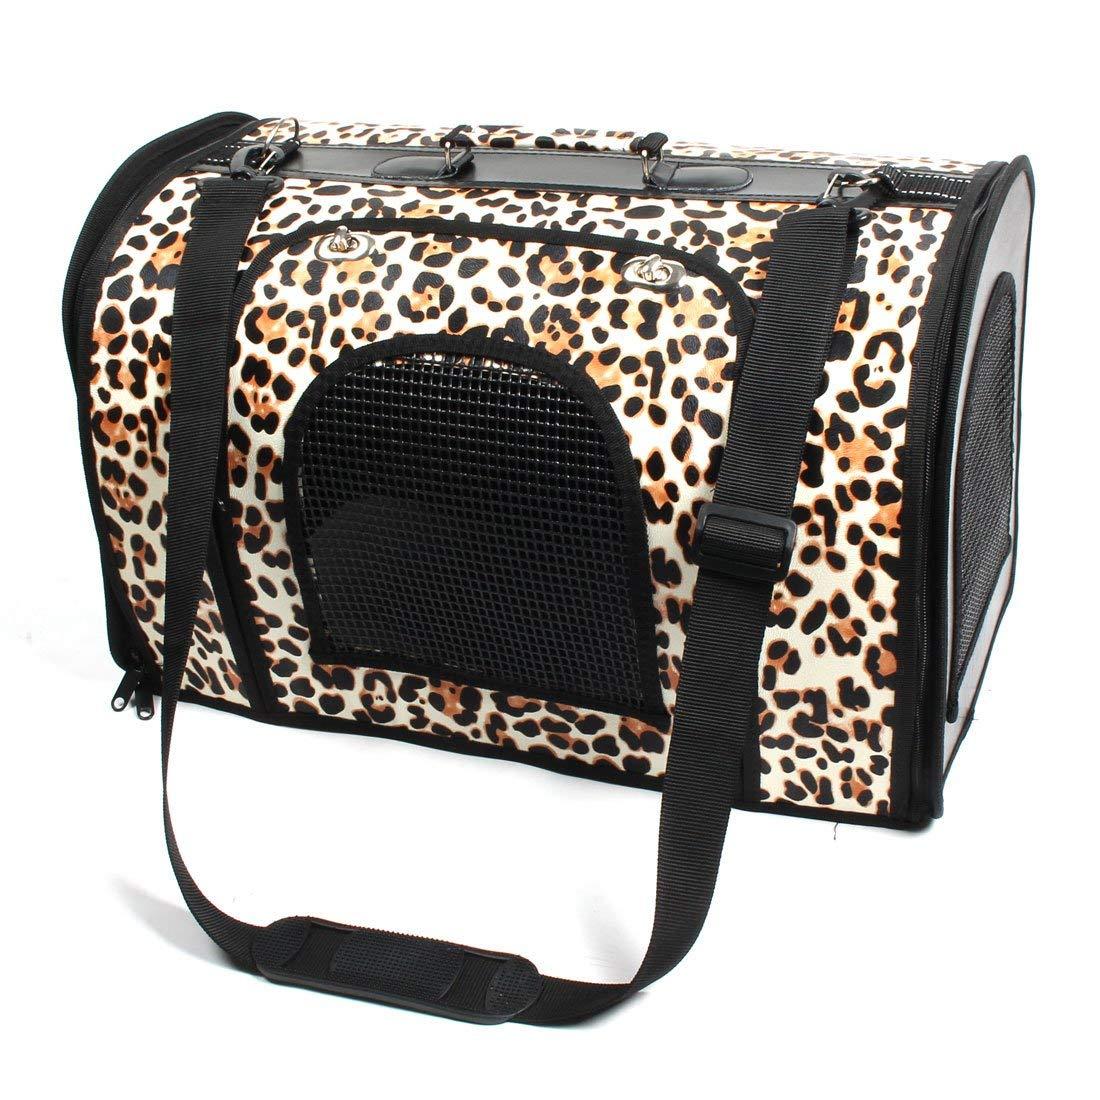 Leopard Pattern Outdoor Camping Pet Puppy Cat Zipper Closure Portable Training Carrier Carrying Kennel Handbag 48.5 x 28.5 x 32cm